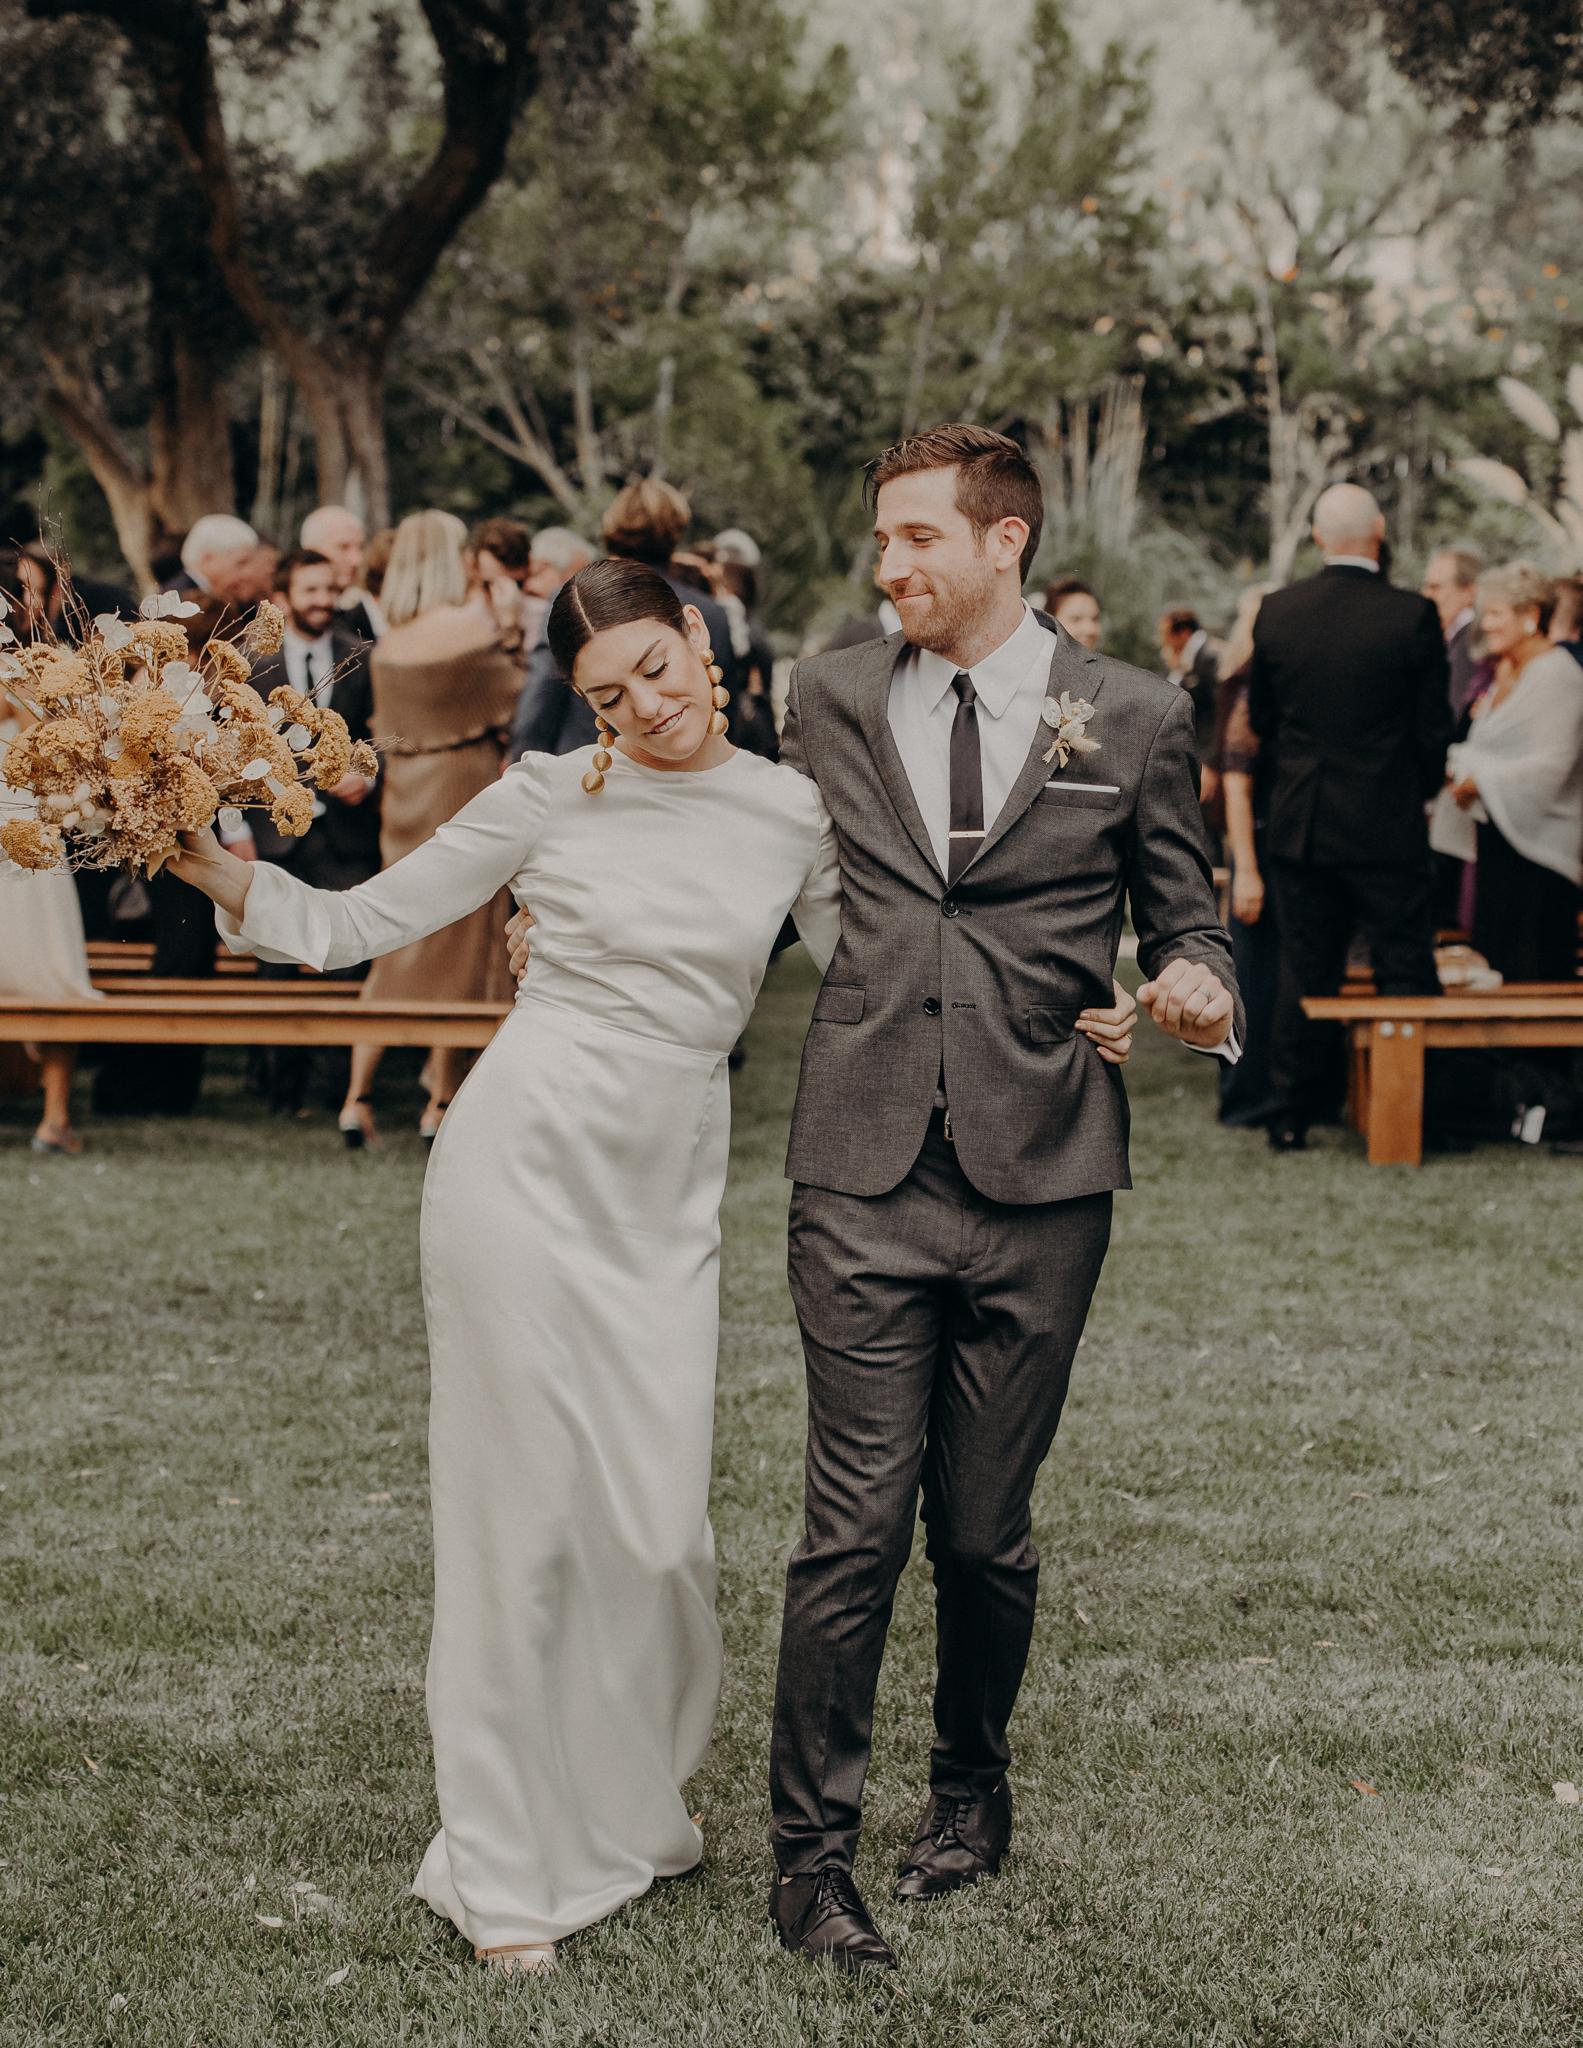 Hummingbird Nest Ranch Wedding - Wedding Photographer in Los Angeles - IsaiahAndTaylor.com-053.jpg